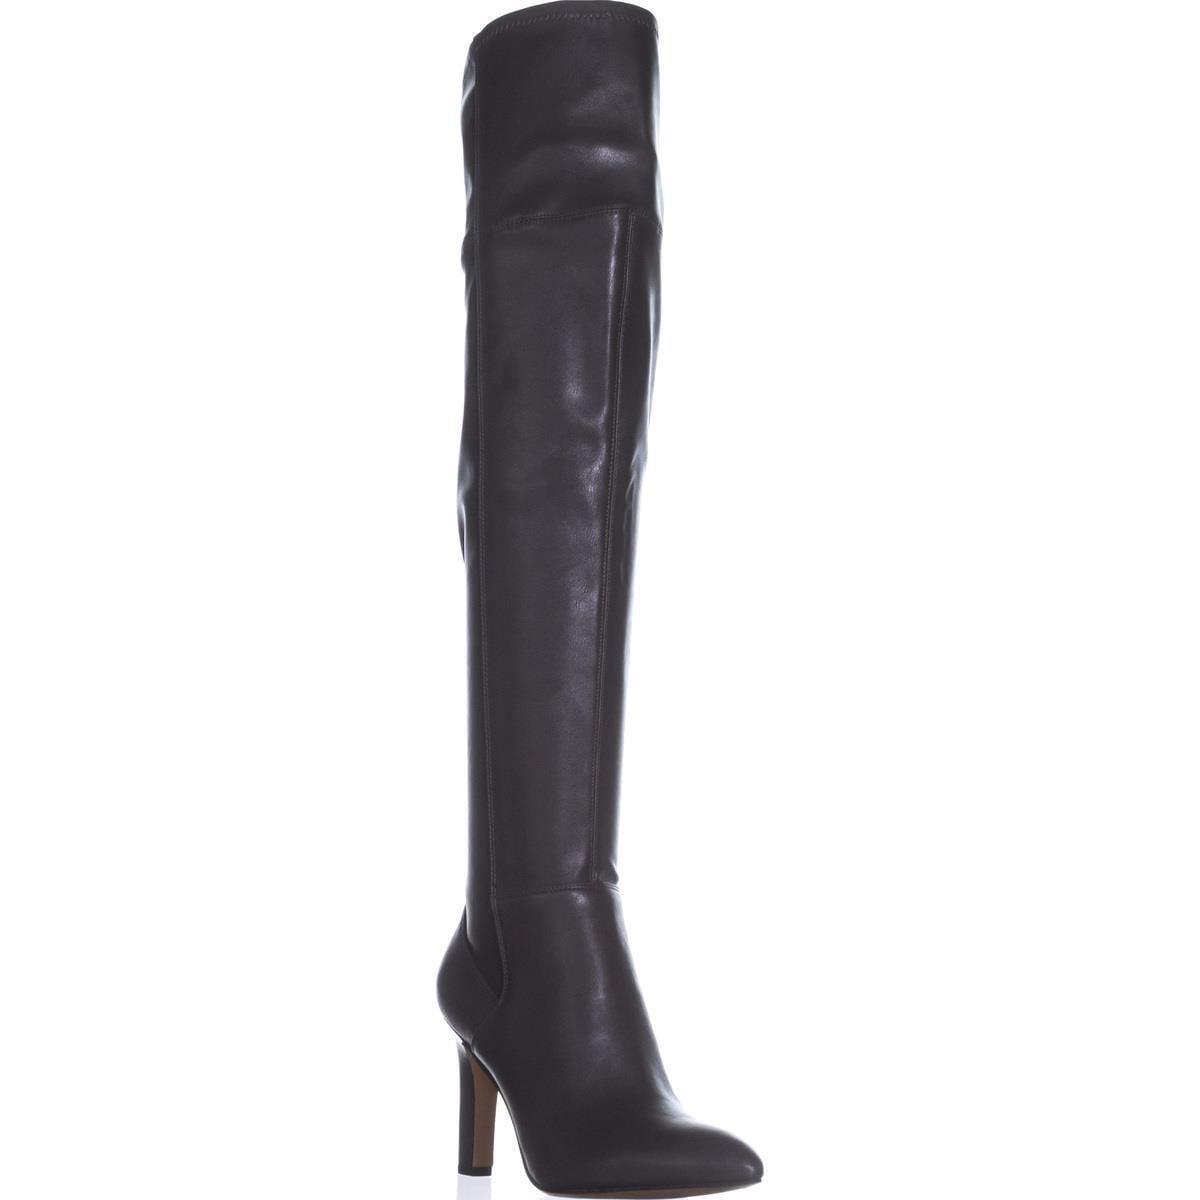 93ee35295a30 Brown Franco Sarto Women s Shoes